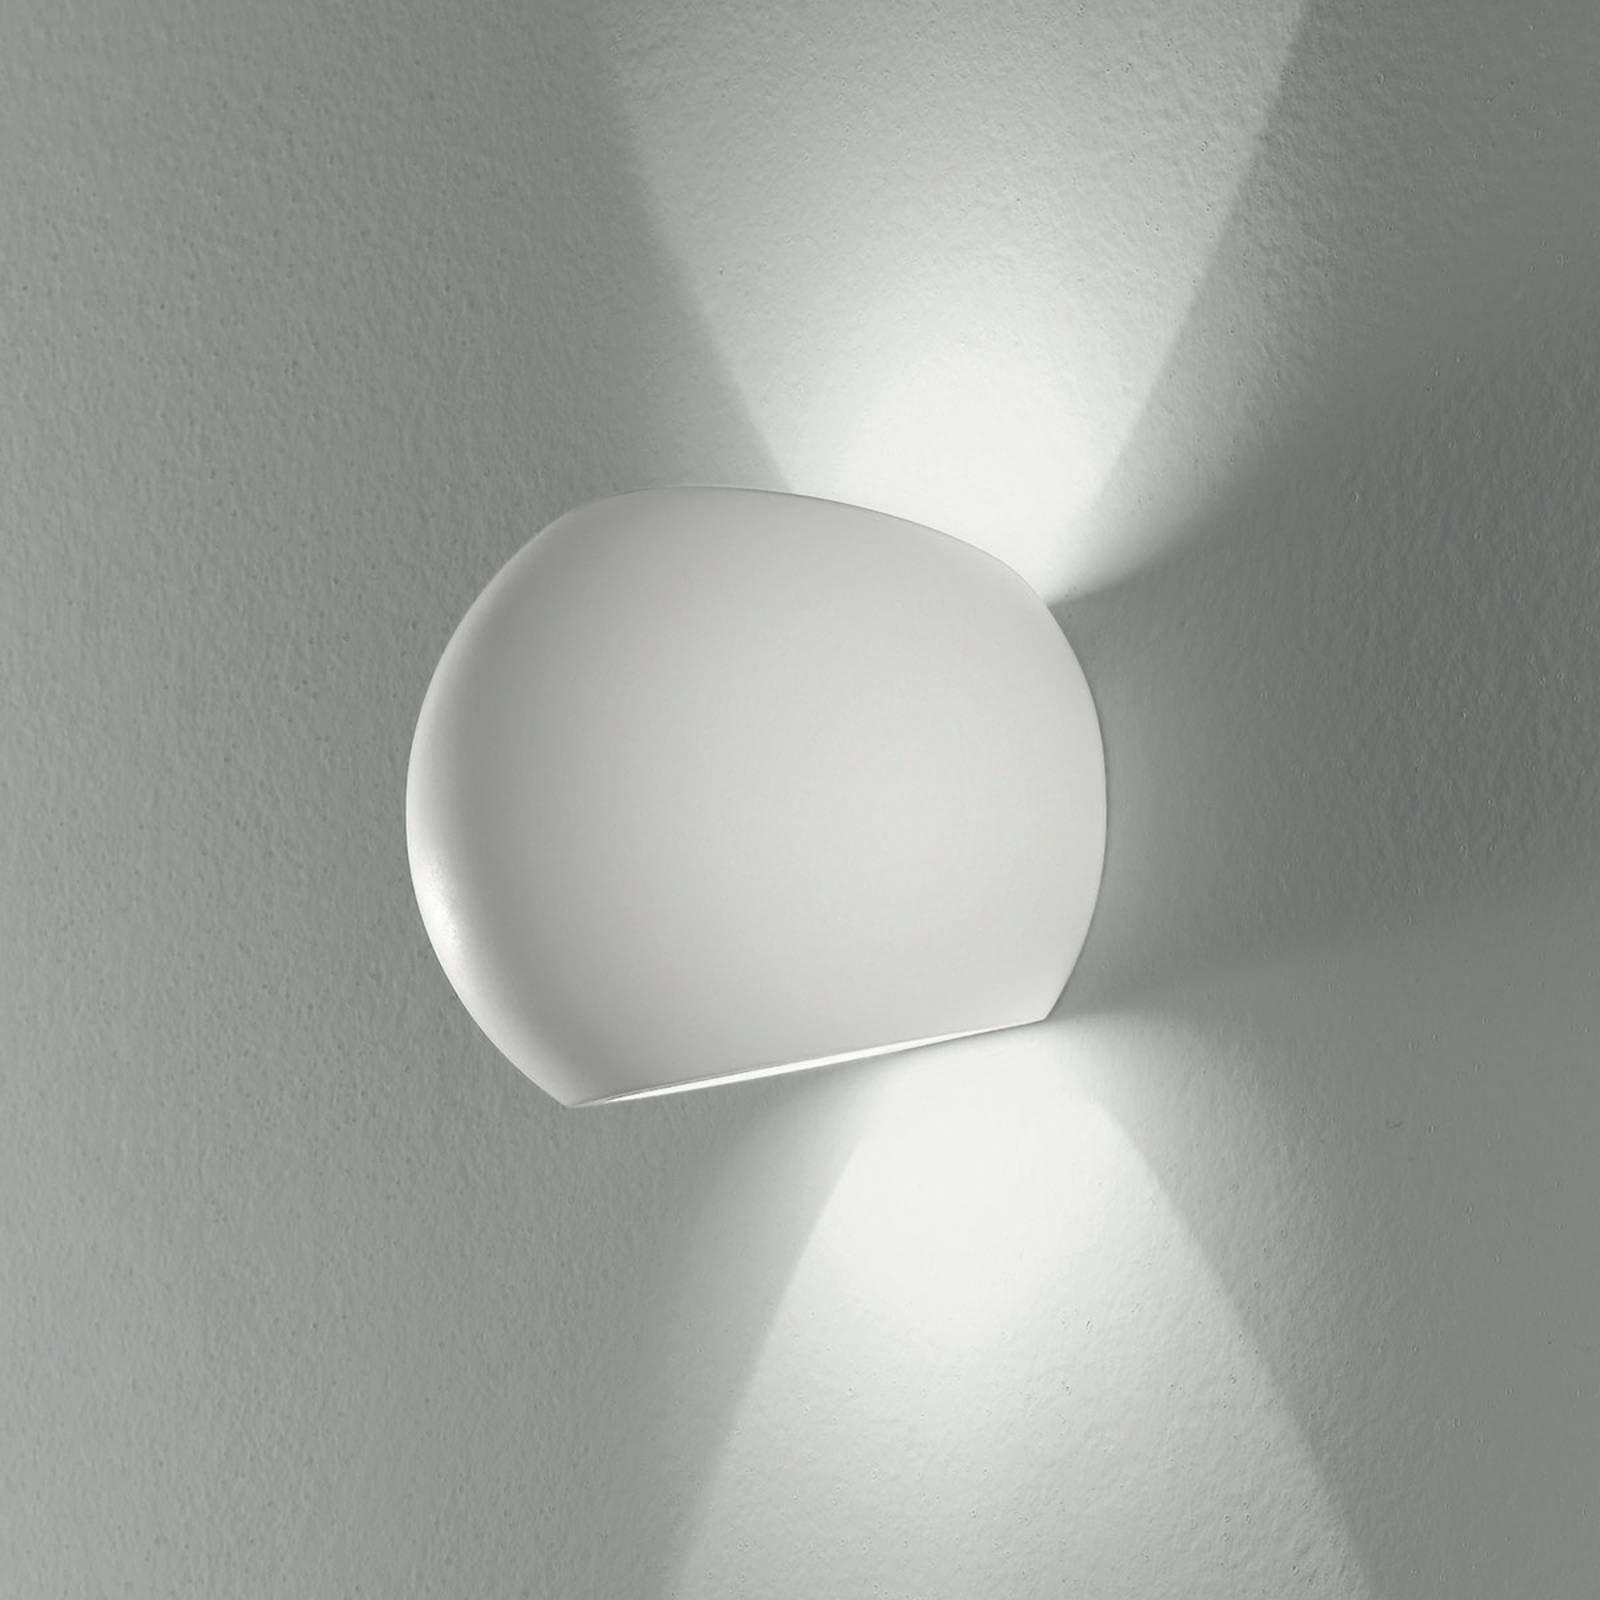 Vegglampe Moses med to lysutganger